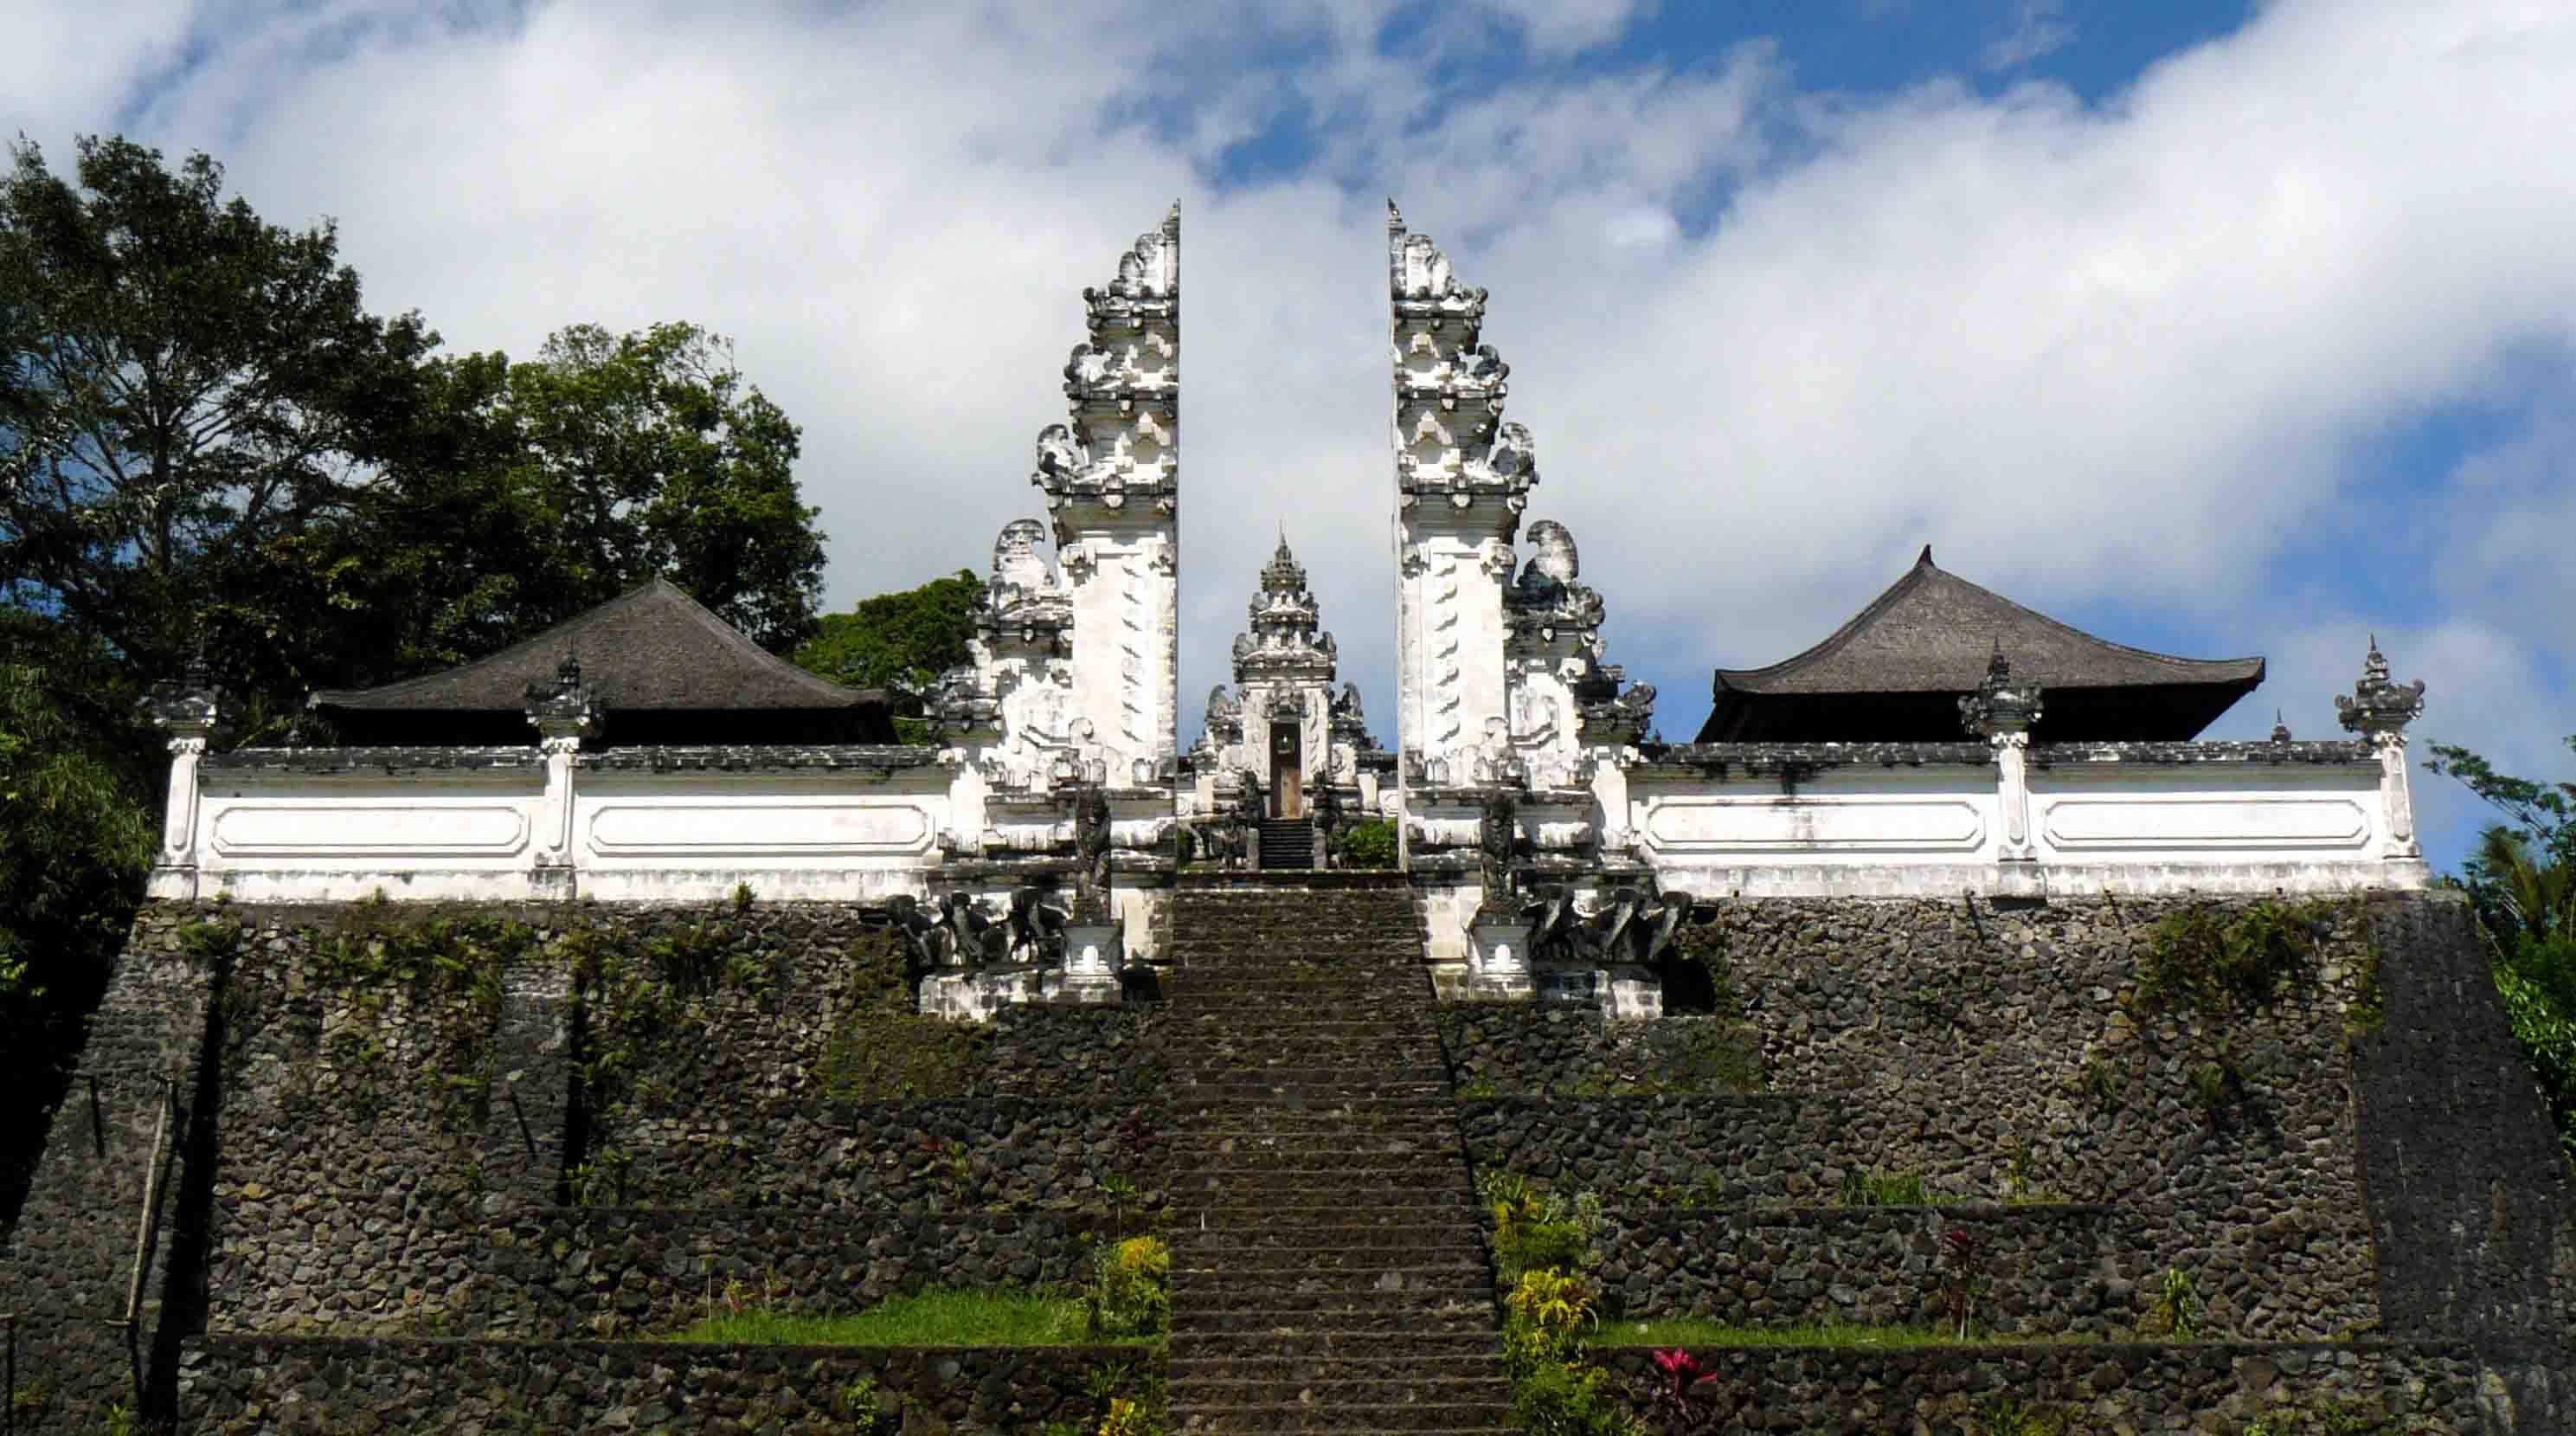 On the slopes of Mount Lempuyang sits Pura Lempuyang Luhur, otherwise known as Lempuyang Temple. T